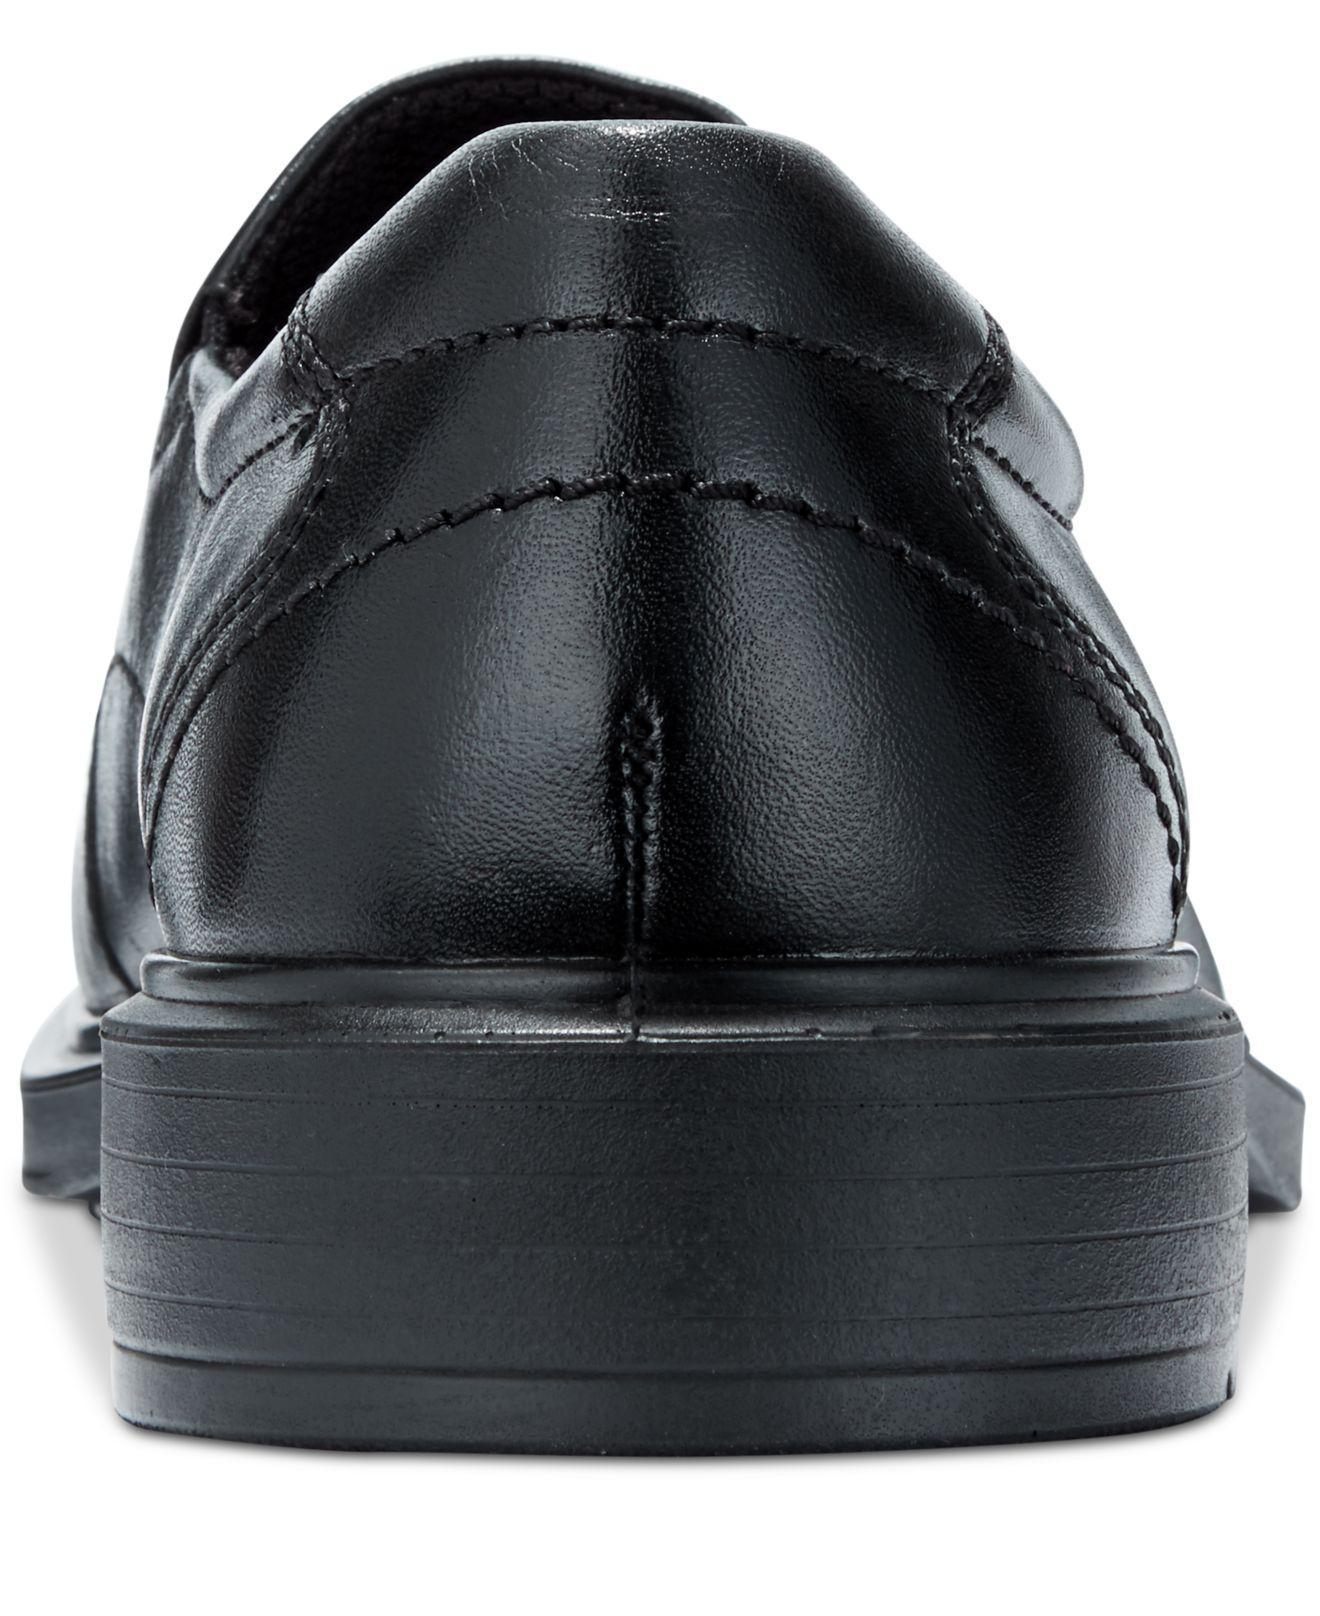 Ecco Leather Helsinki Comfort Loafers